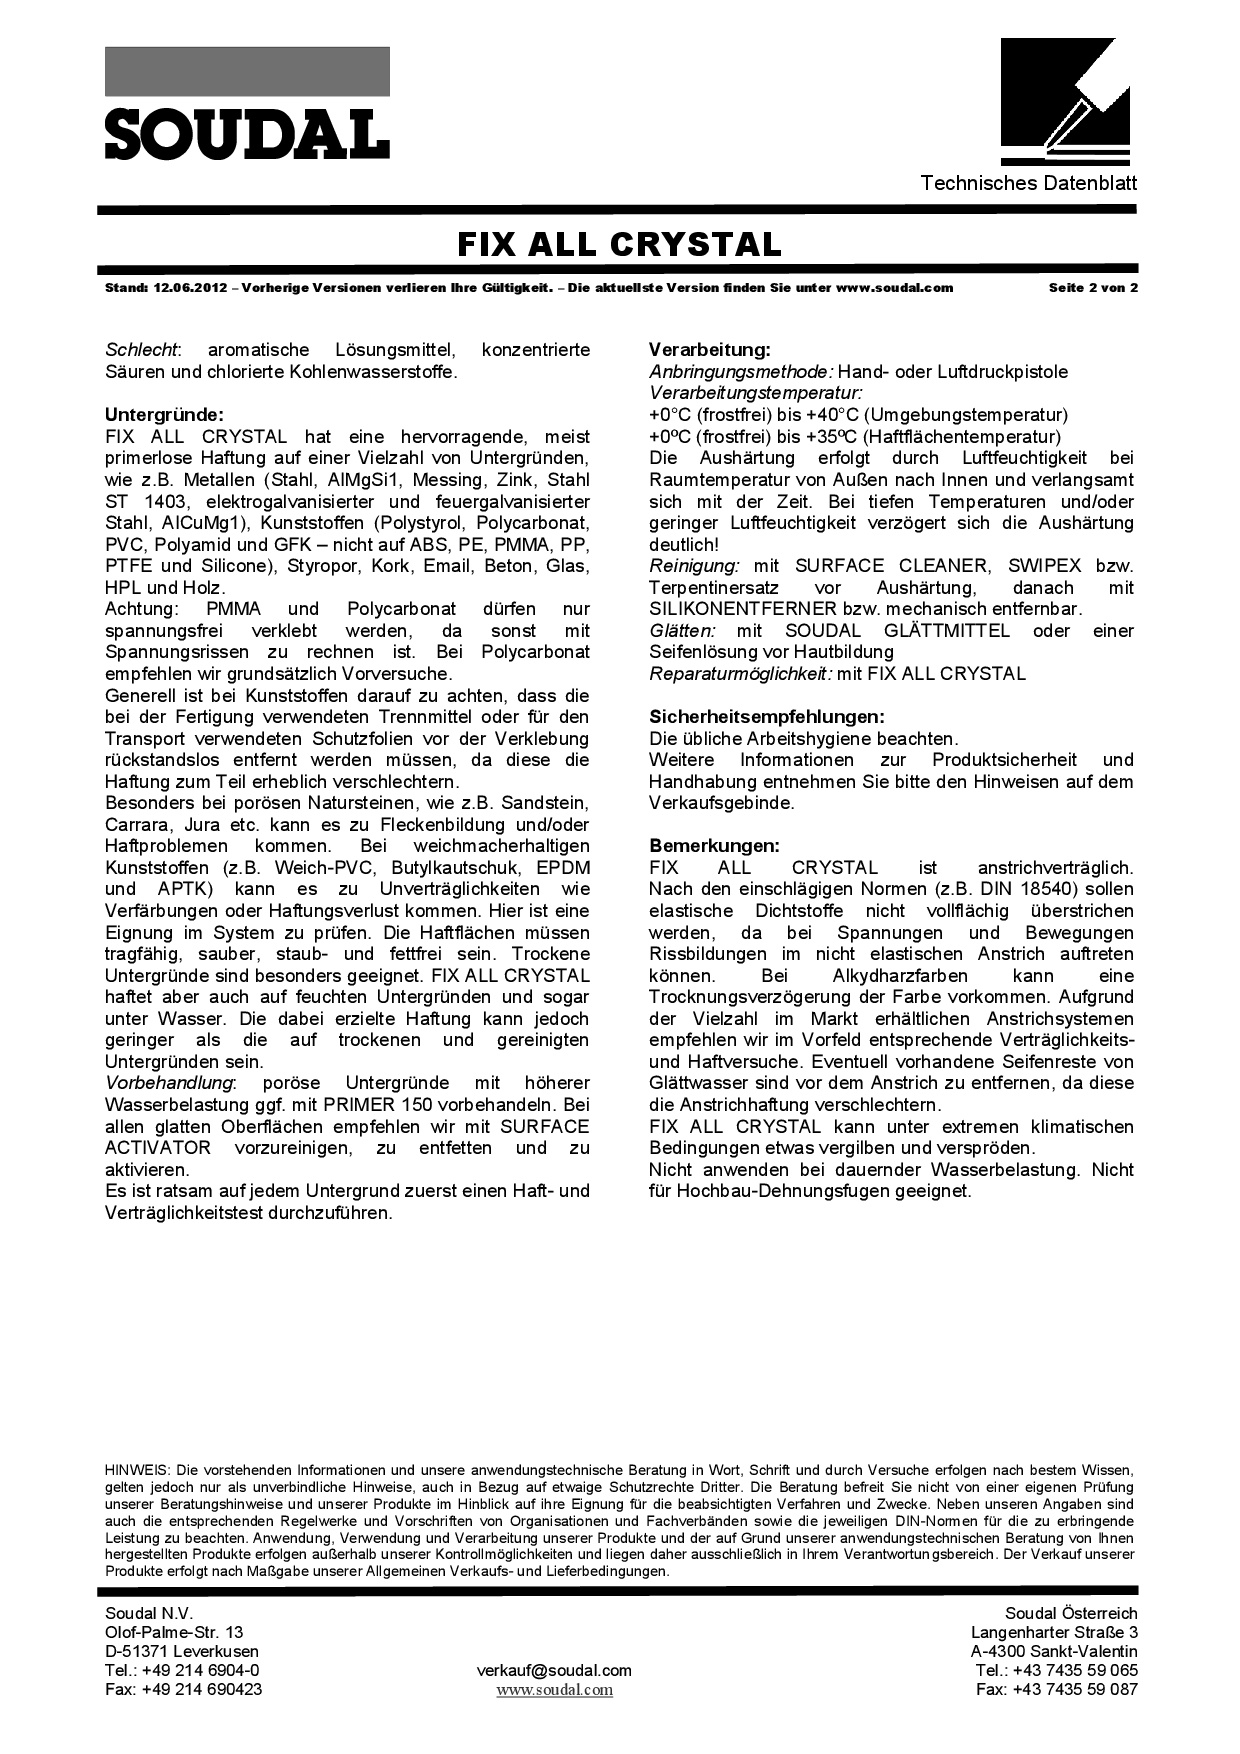 Soudal-Fix-All-Crystal-TD-jpg-002